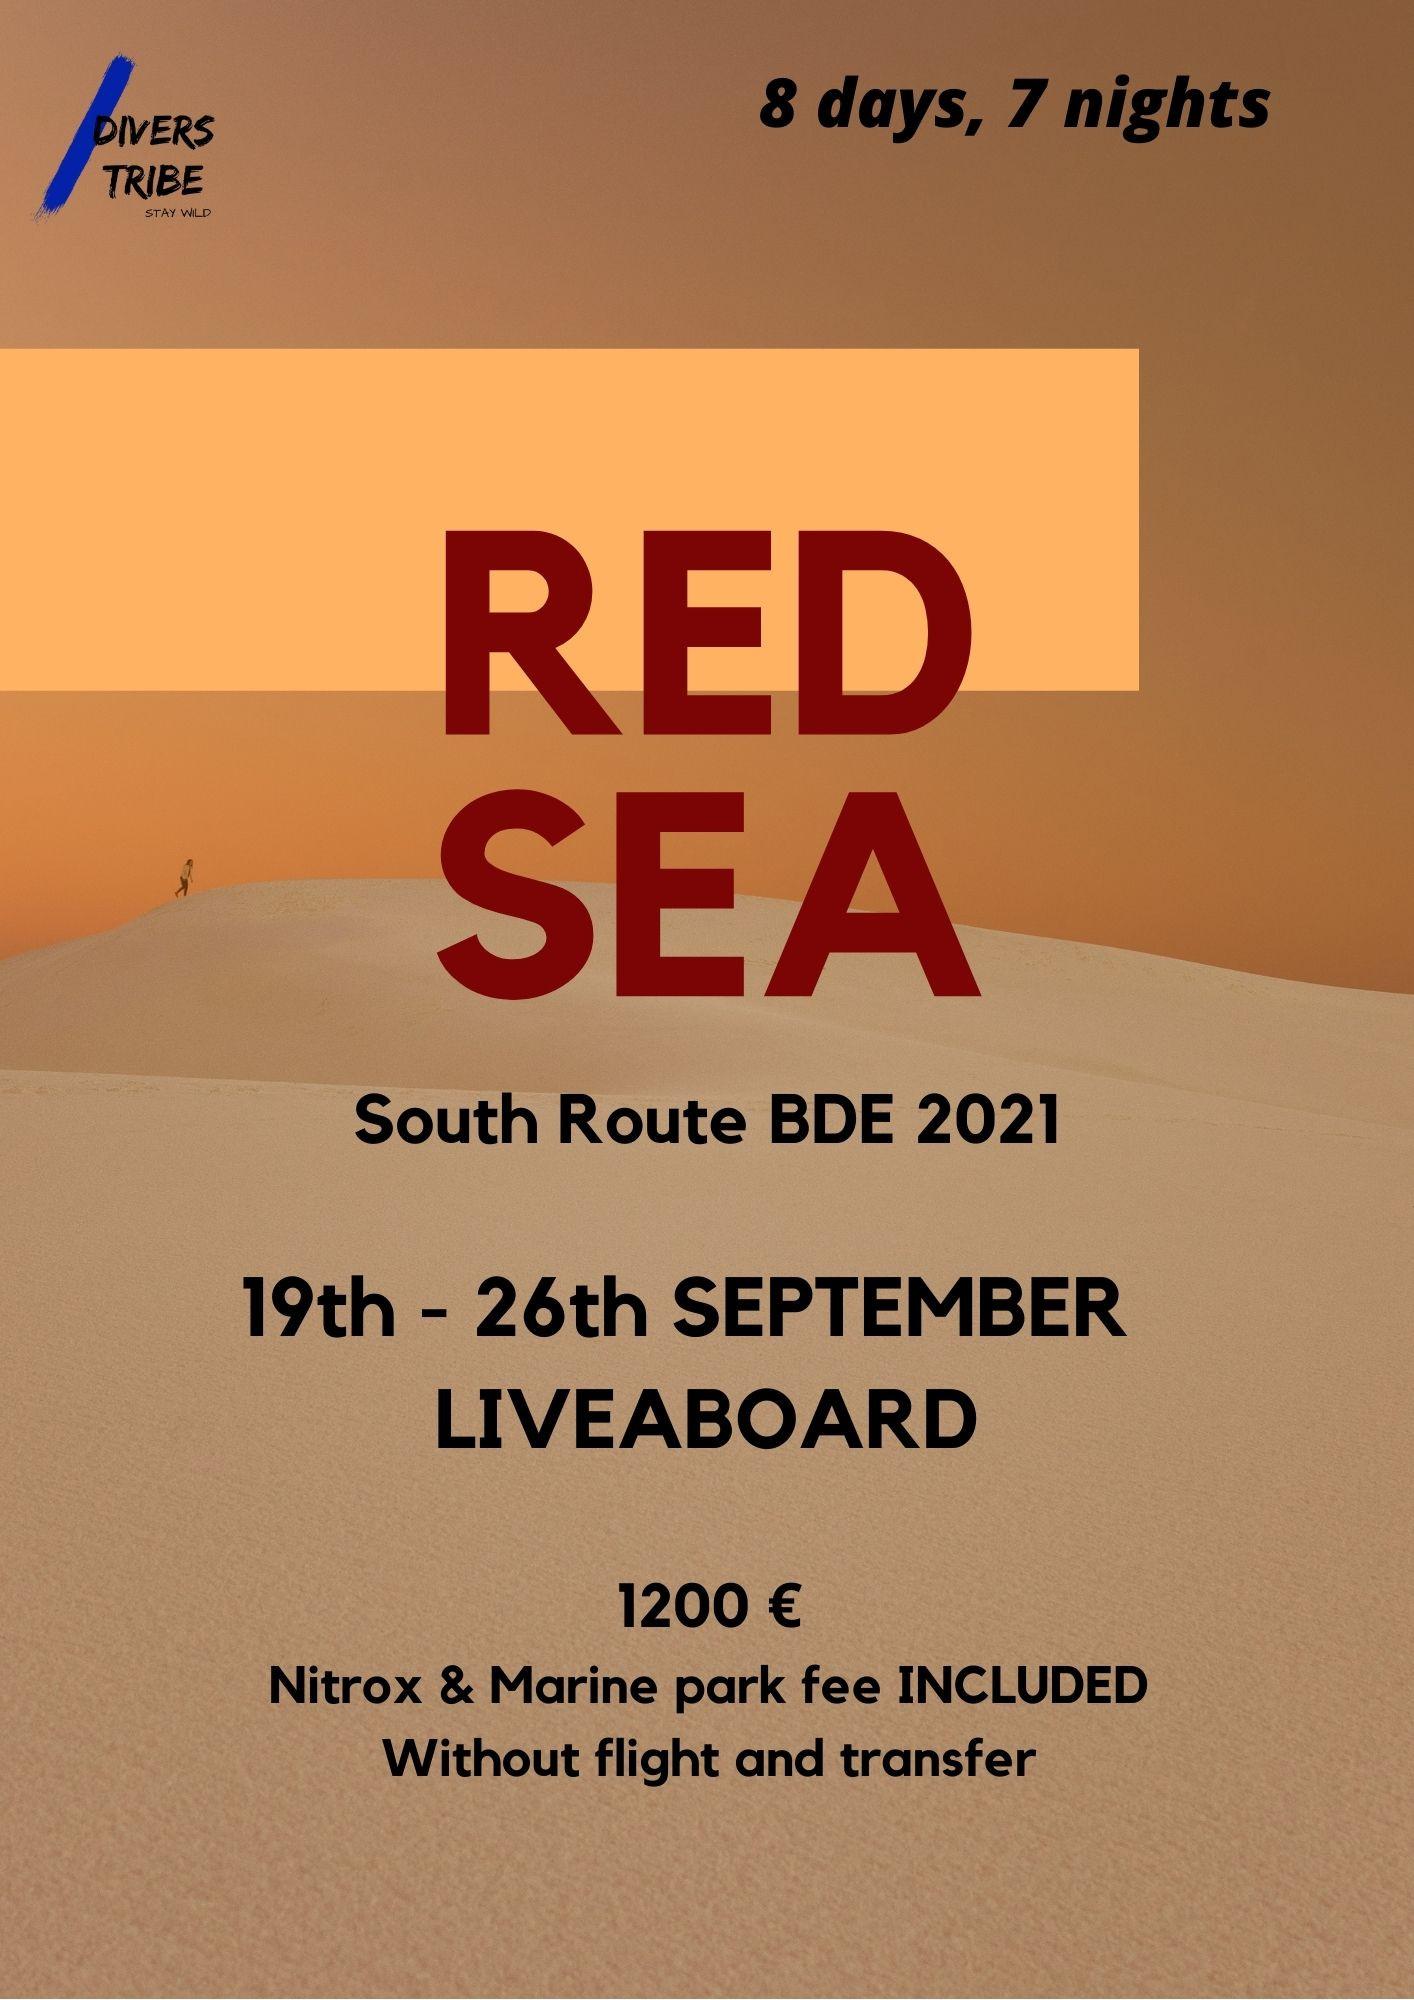 Red Sea Liveaboard